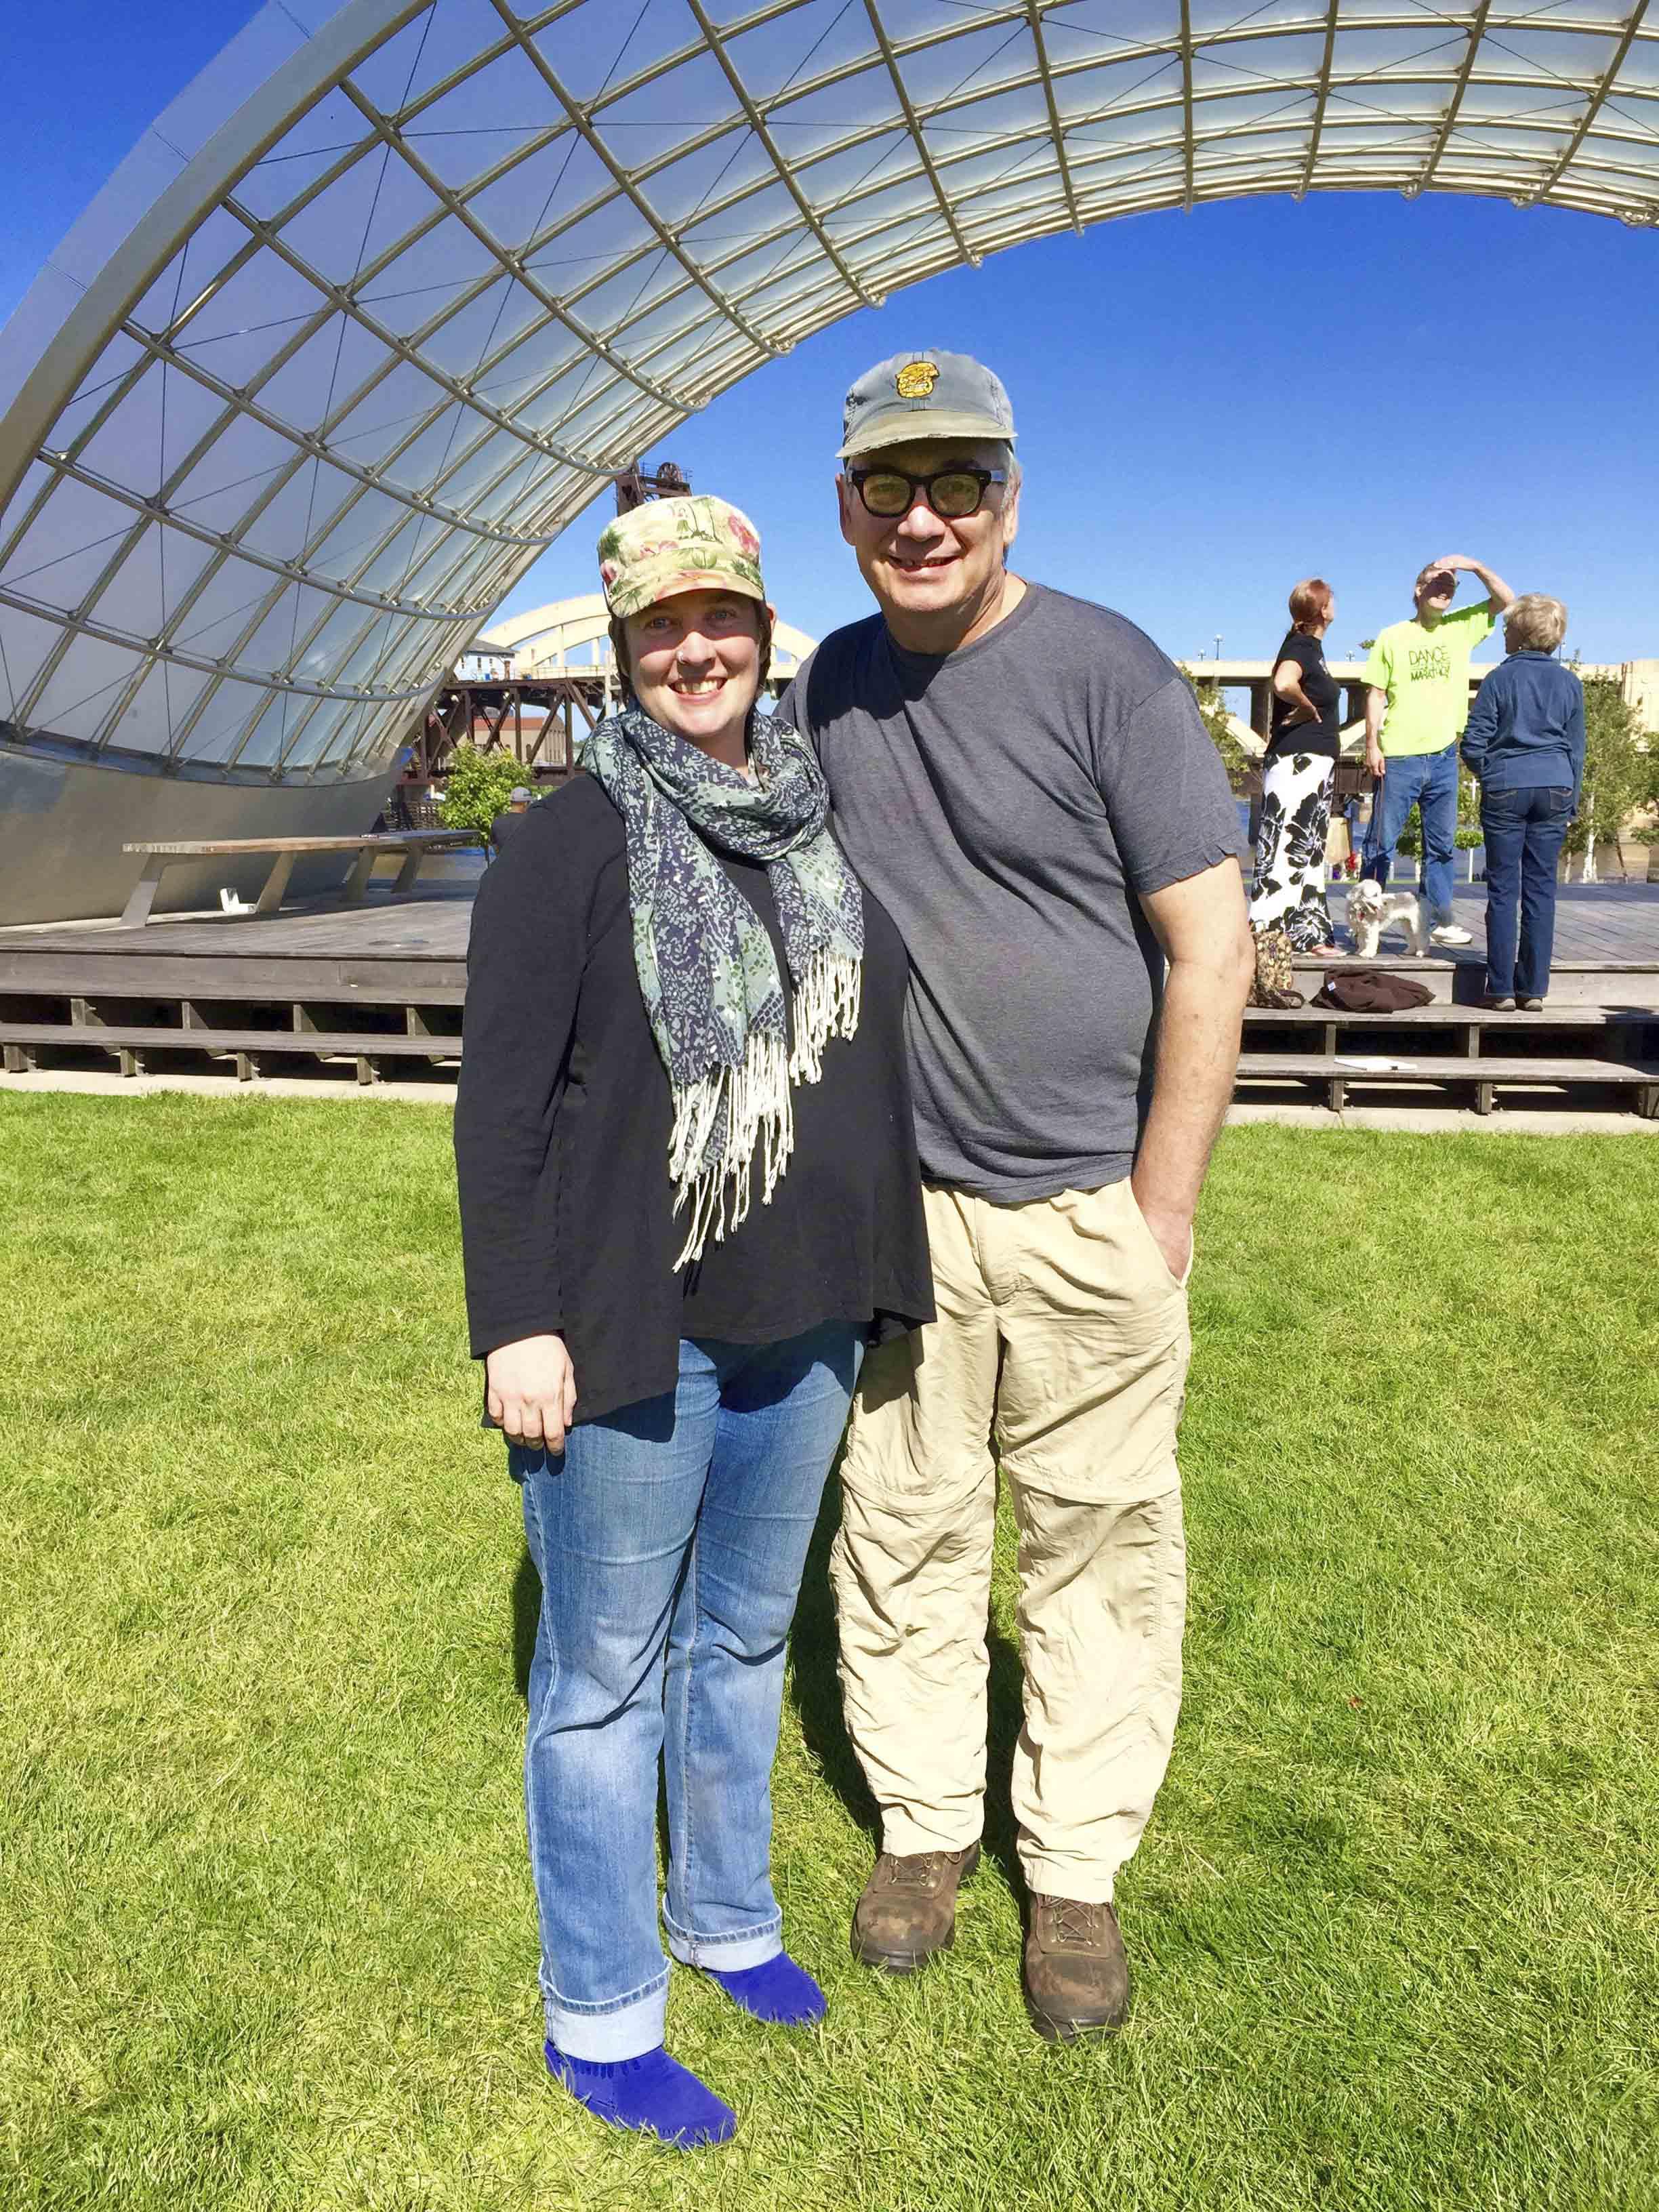 Liz Carlson and Tim Jennen - Founders of MetroSketchers